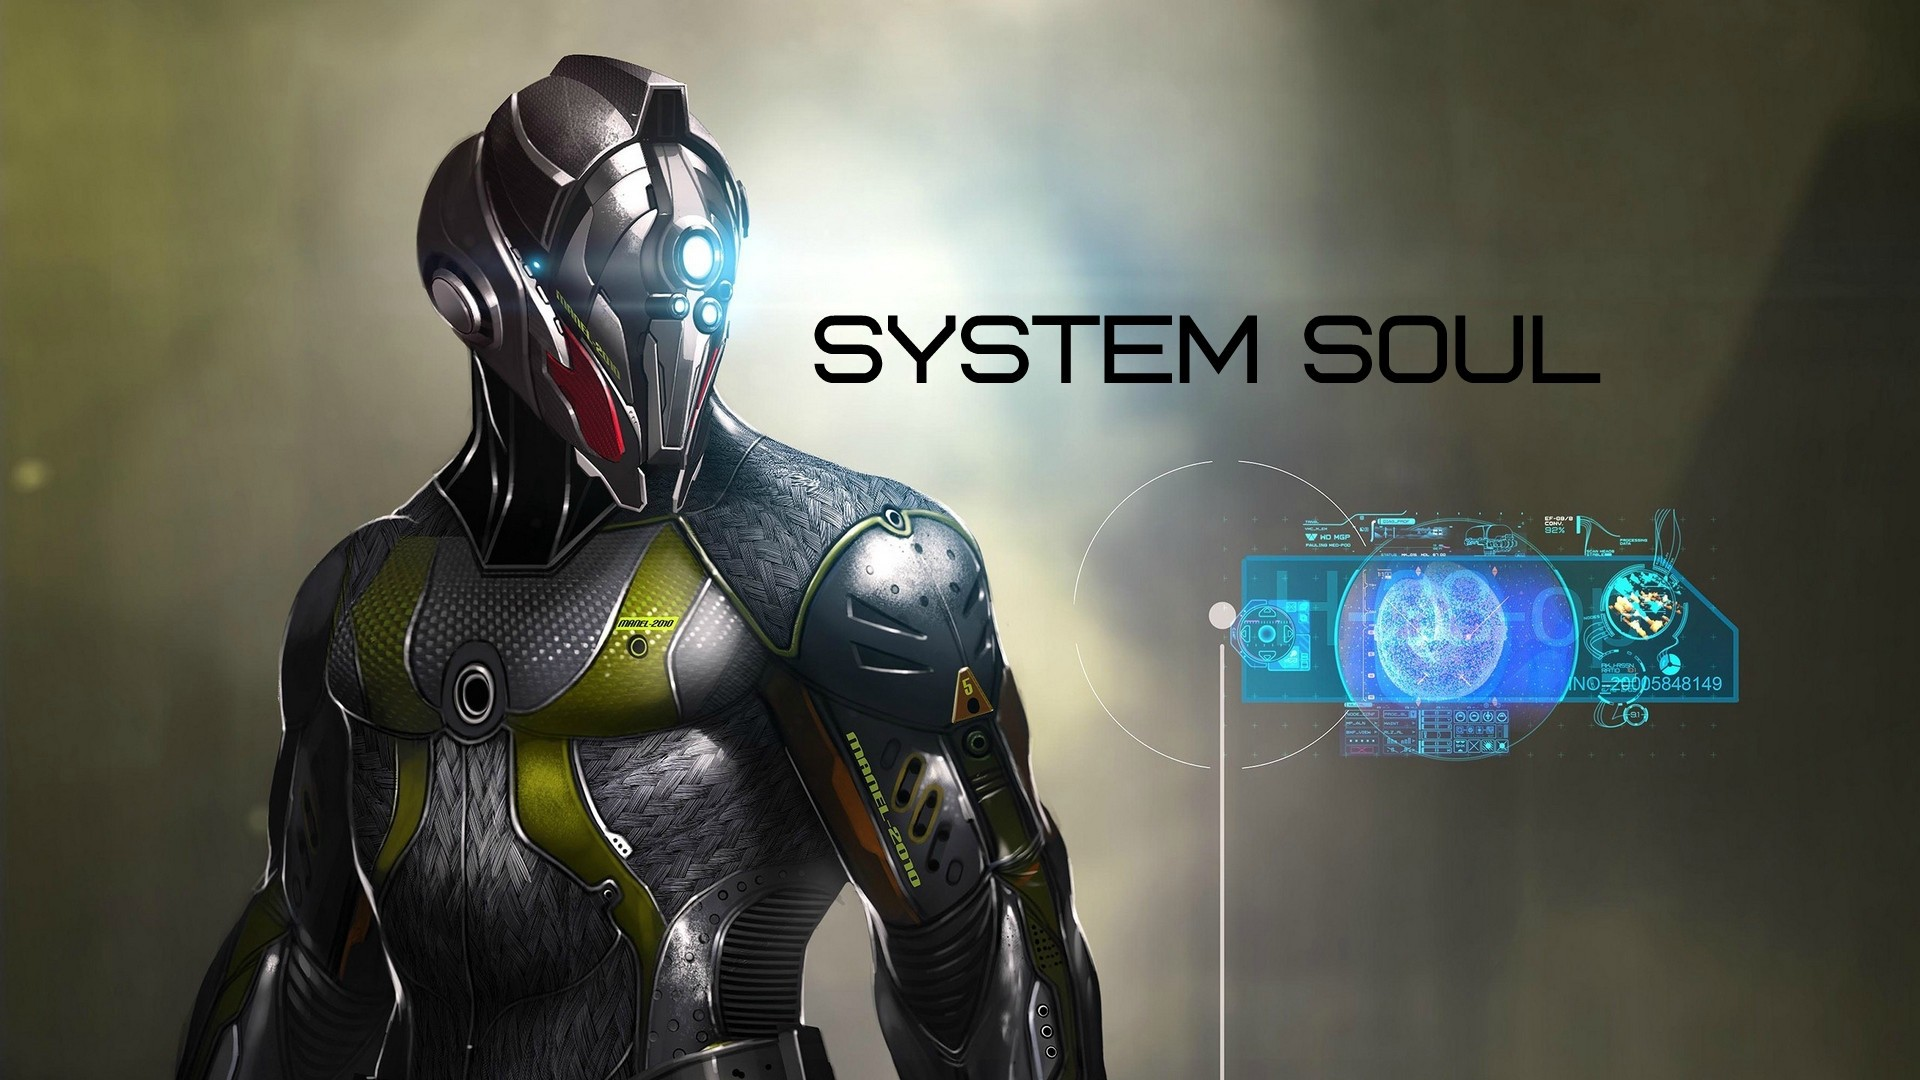 Cyborg Wallpaper Download Full